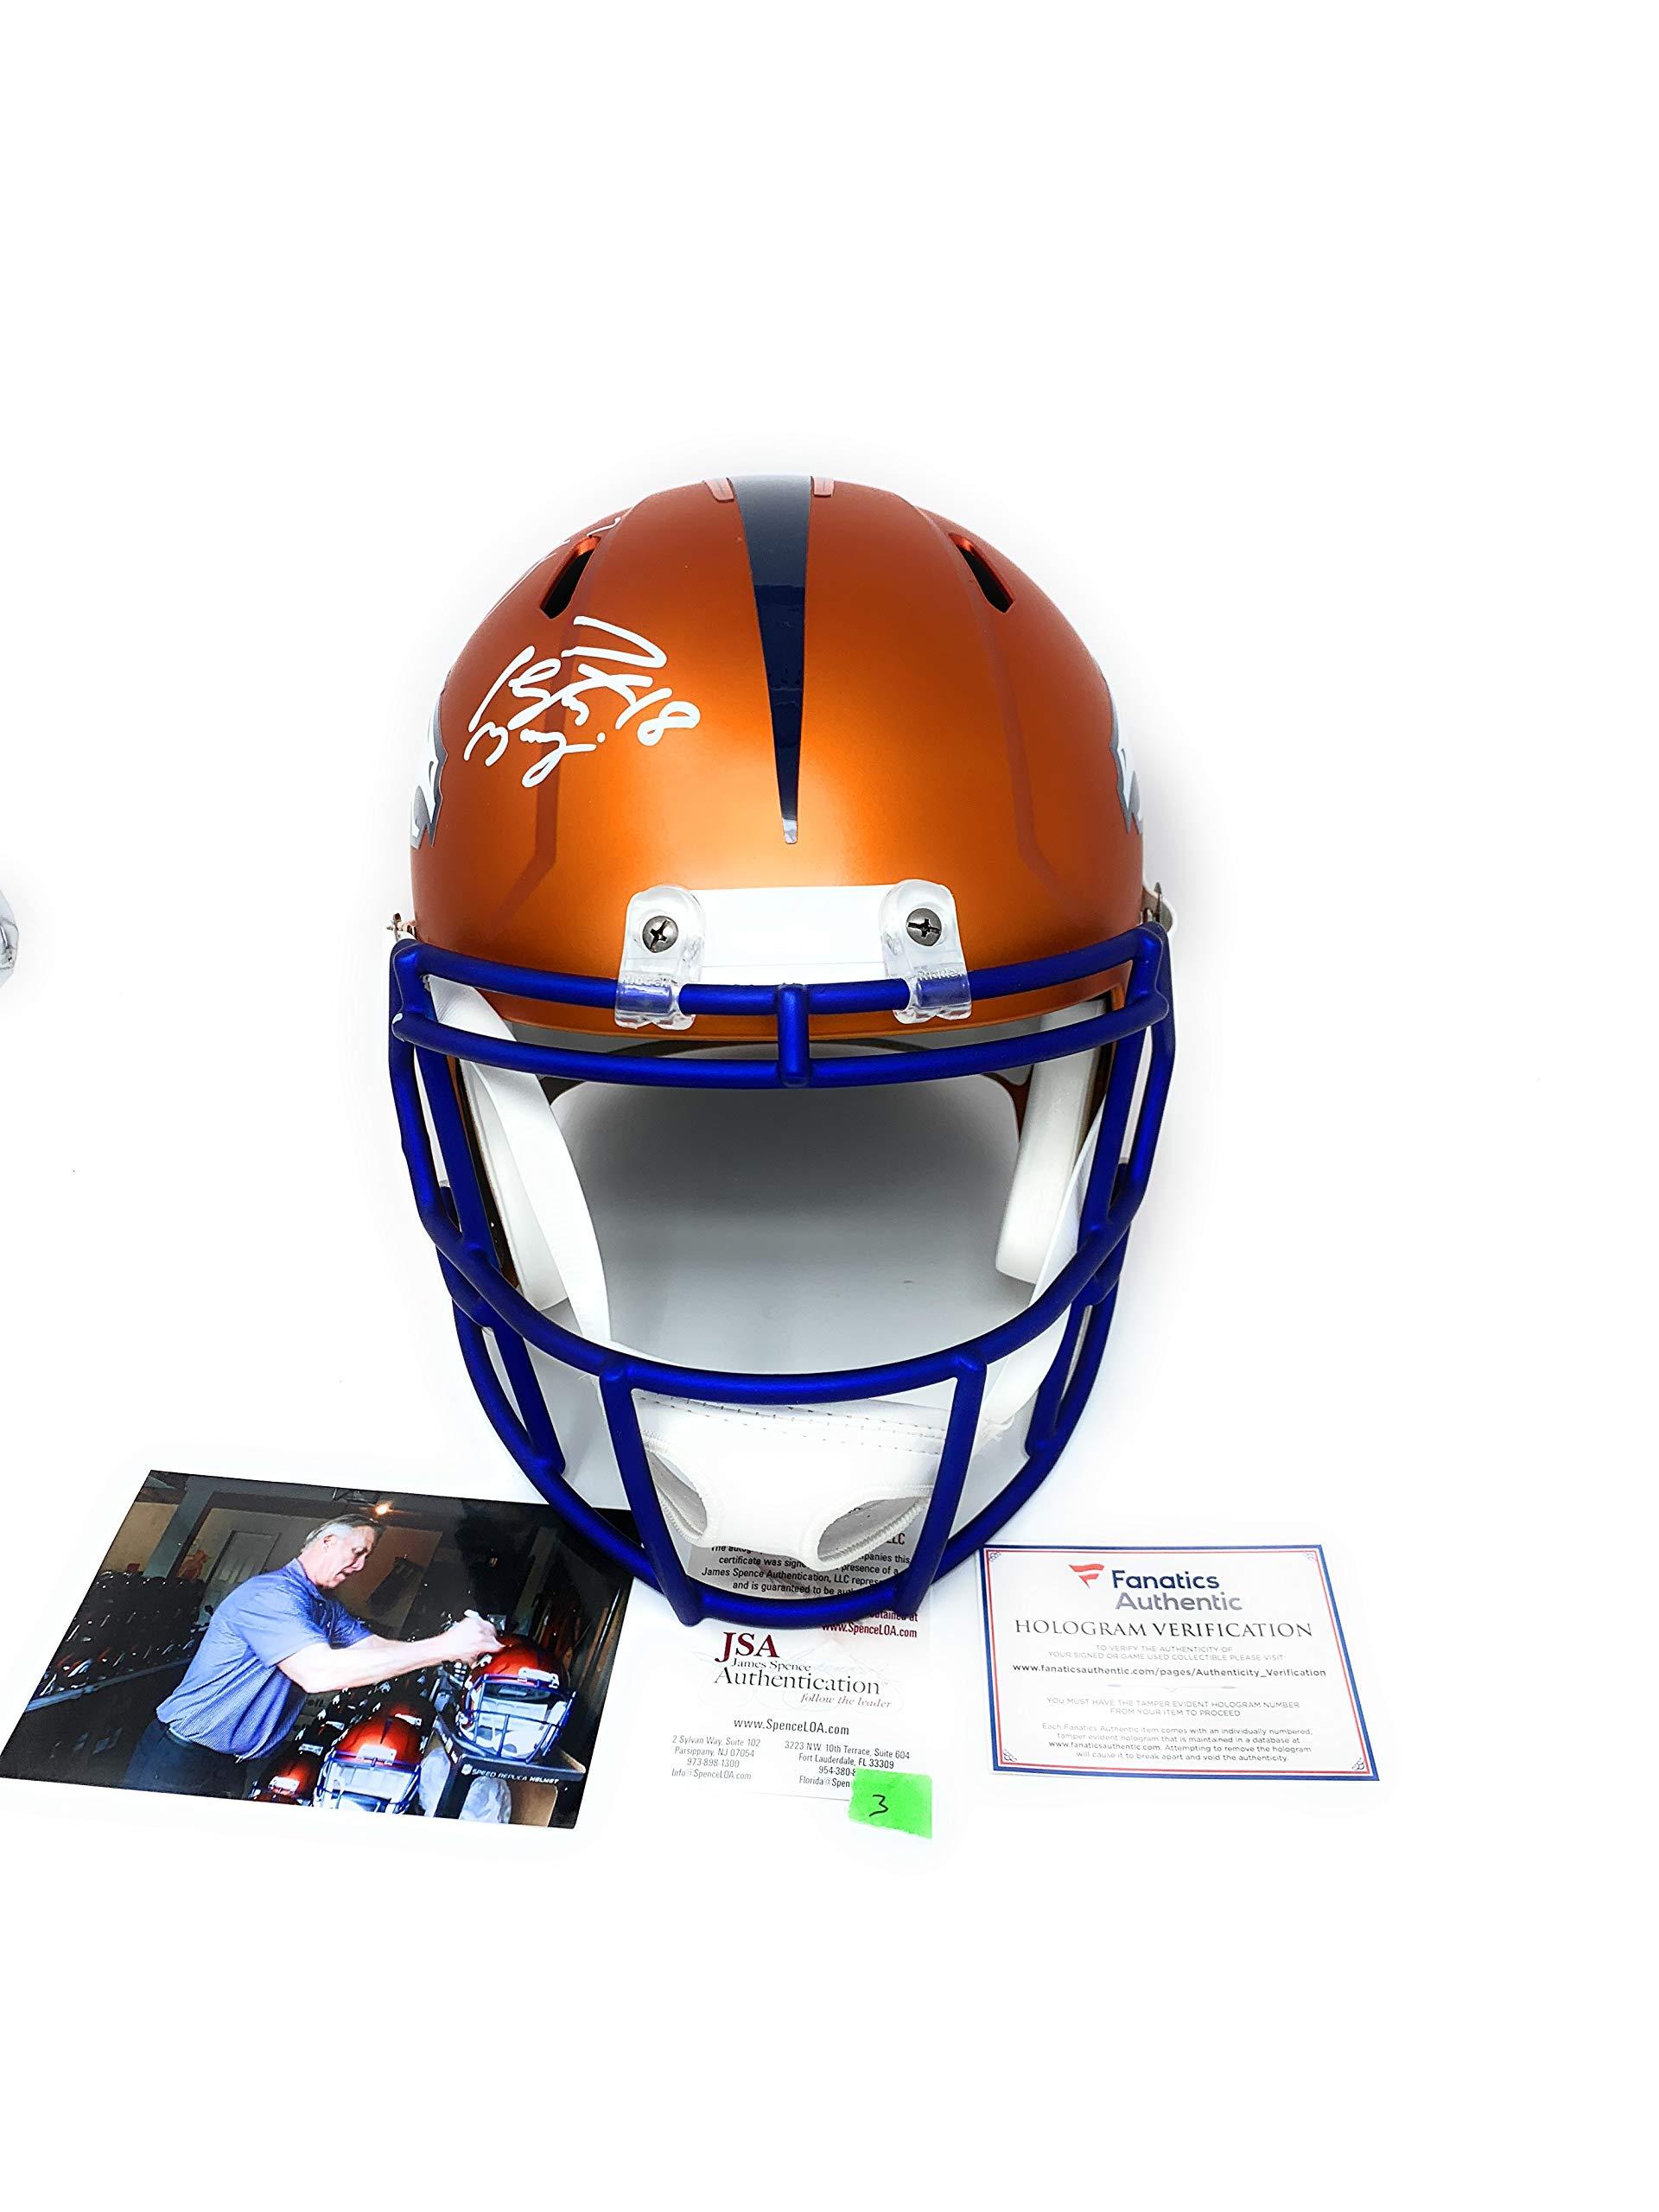 Peyton Manning John Elway Denver Broncos DUAL Signed Autograph Rare BLAZE Speed Full Size Helmet Elway Holo JSA Witnessed Fanatics Authentic Certified #3